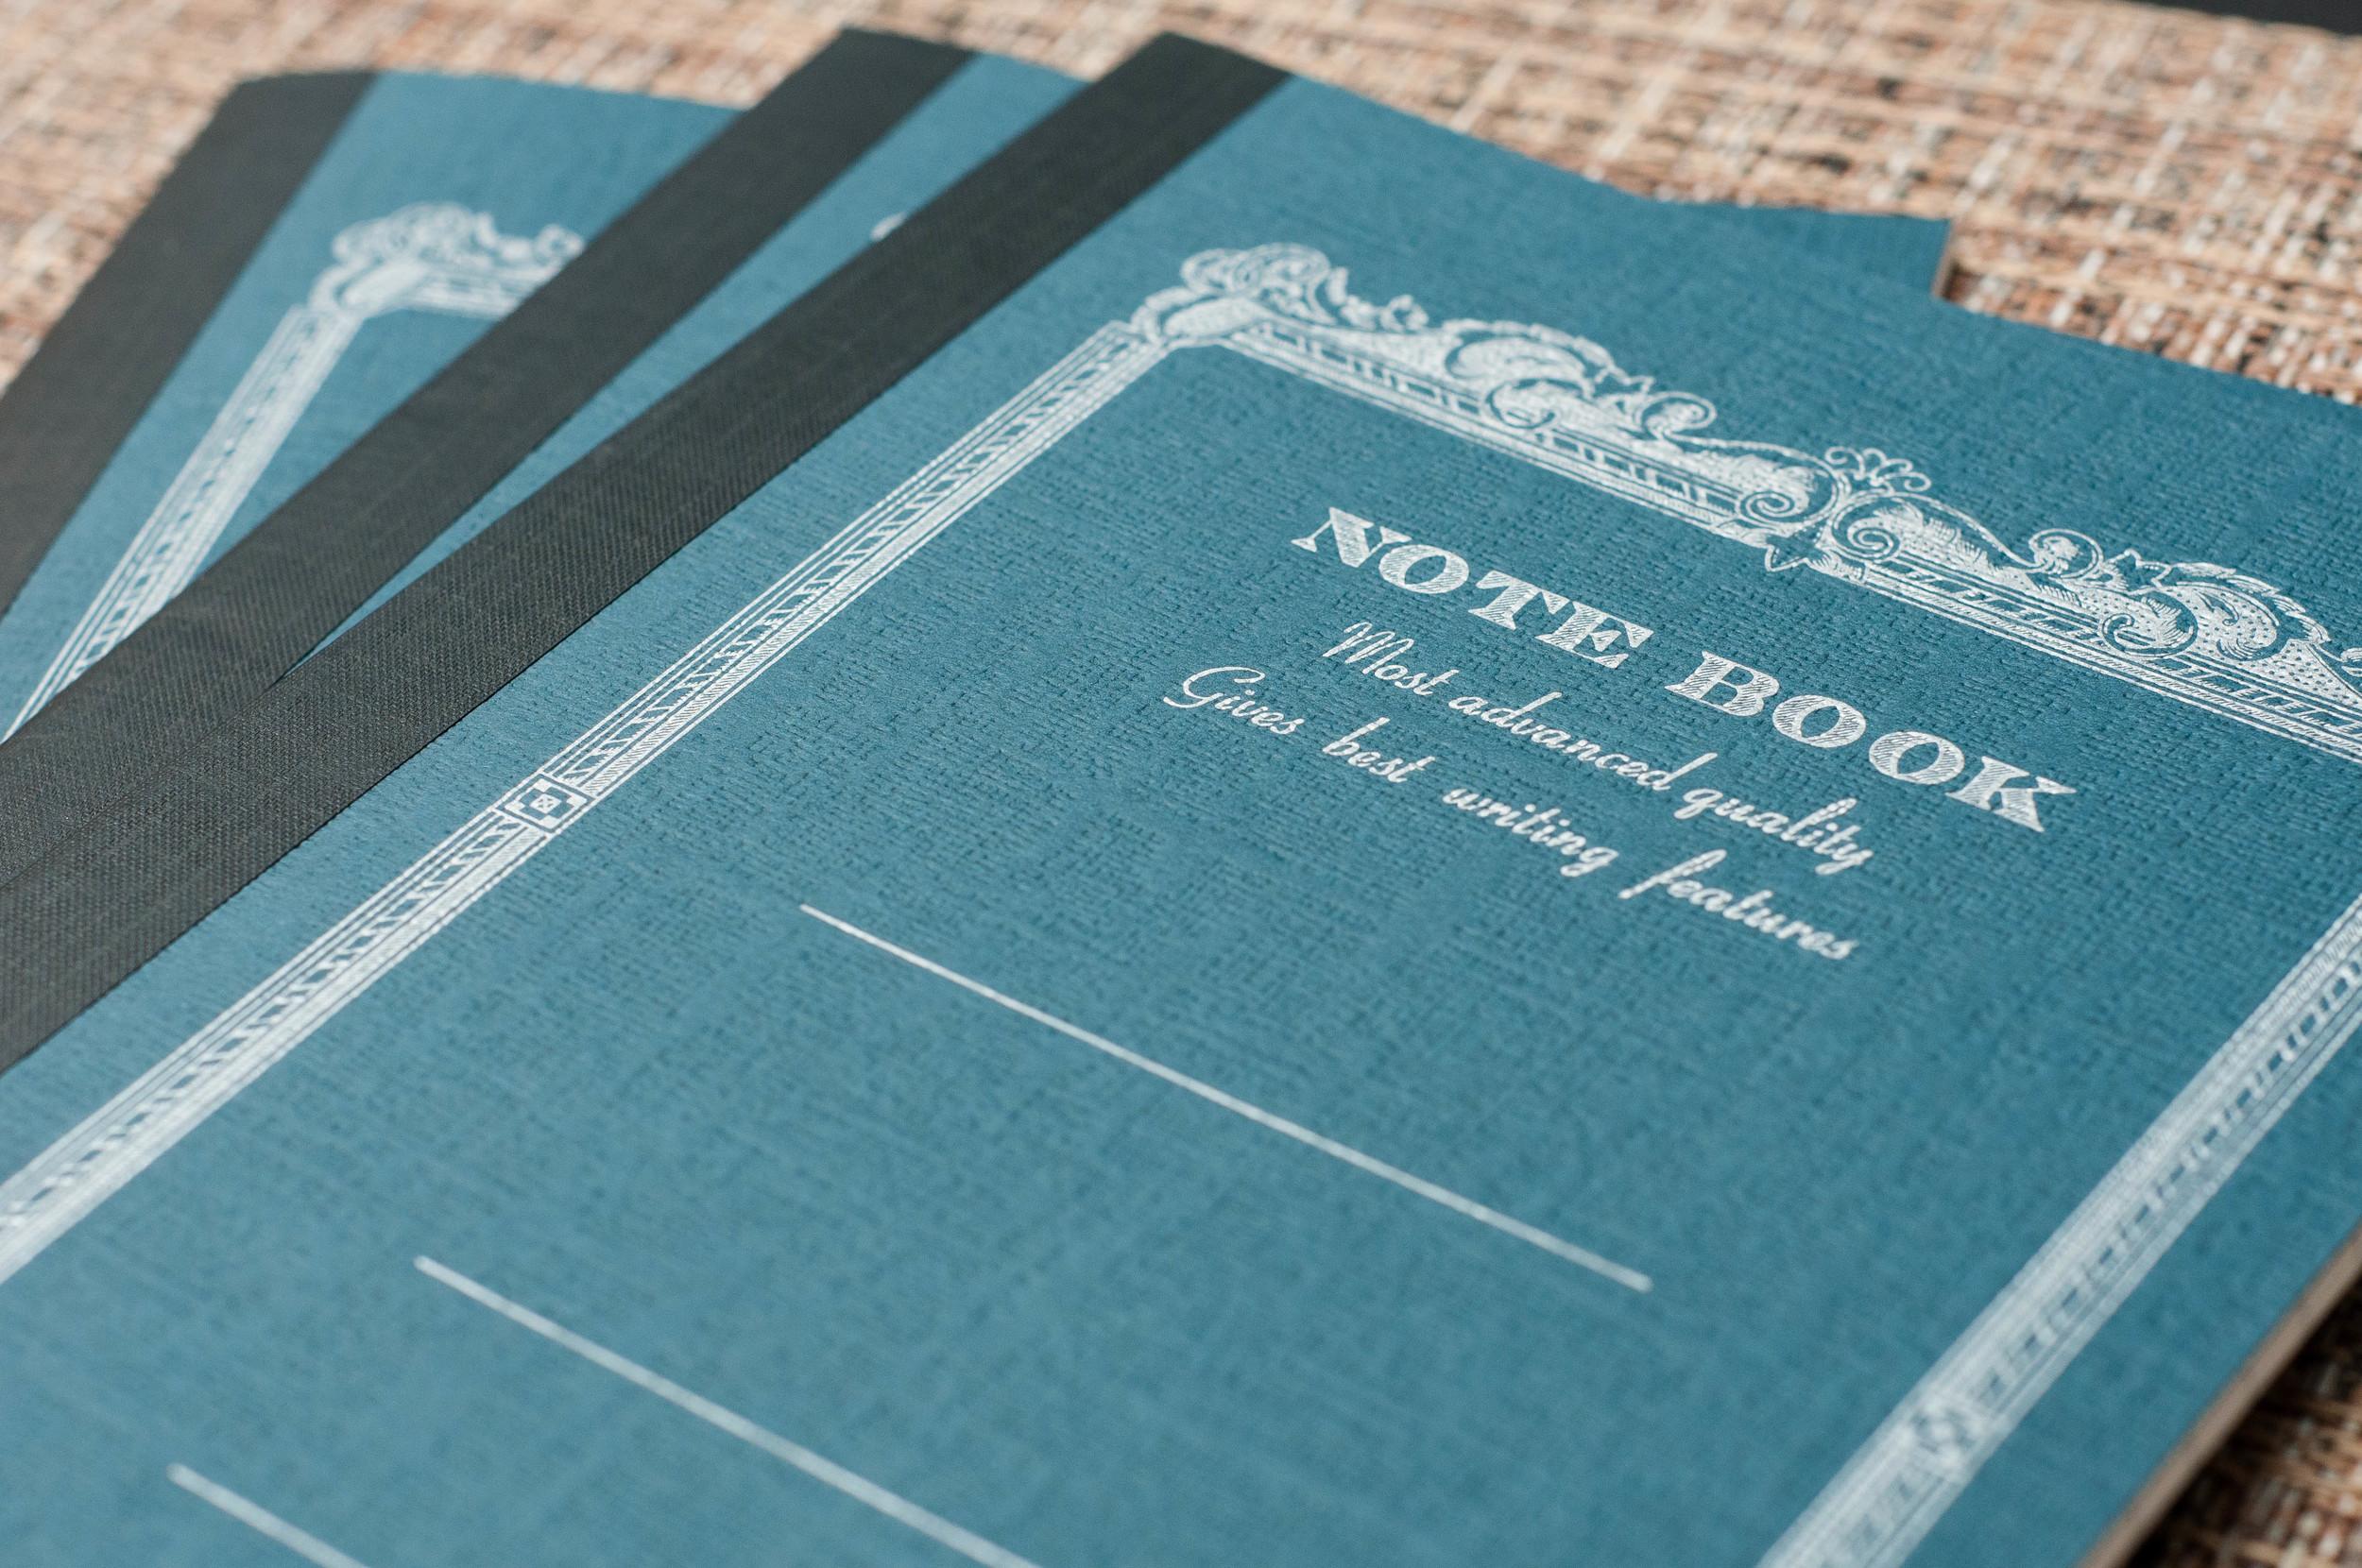 Apica CD Notebook Cover.jpg